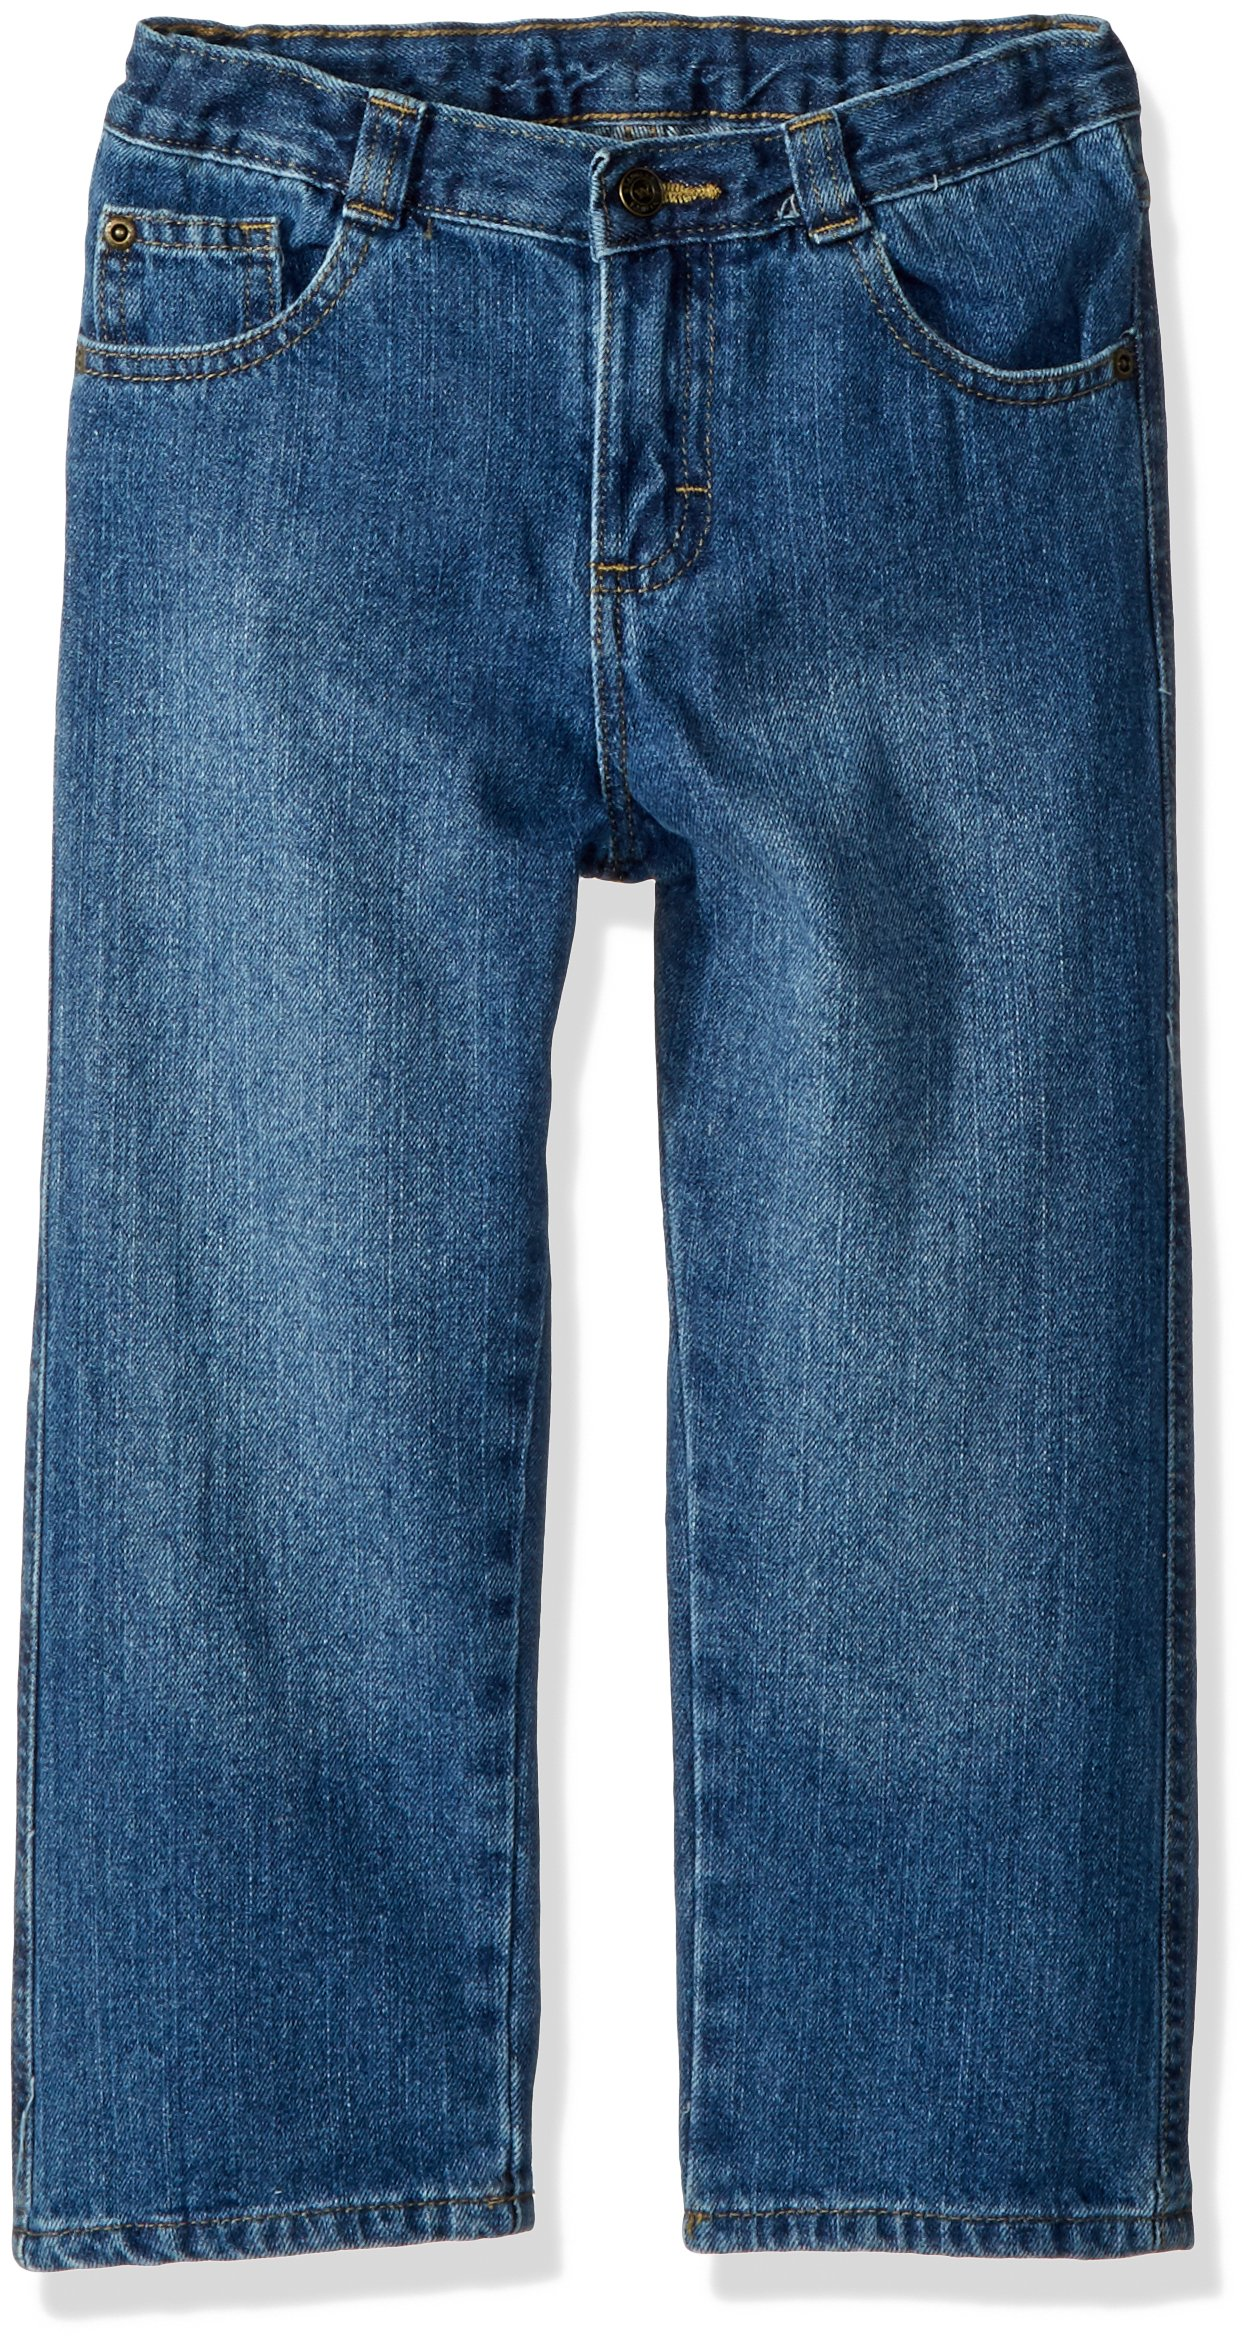 Wrangler Authentics Boys Relaxed Straight Jean